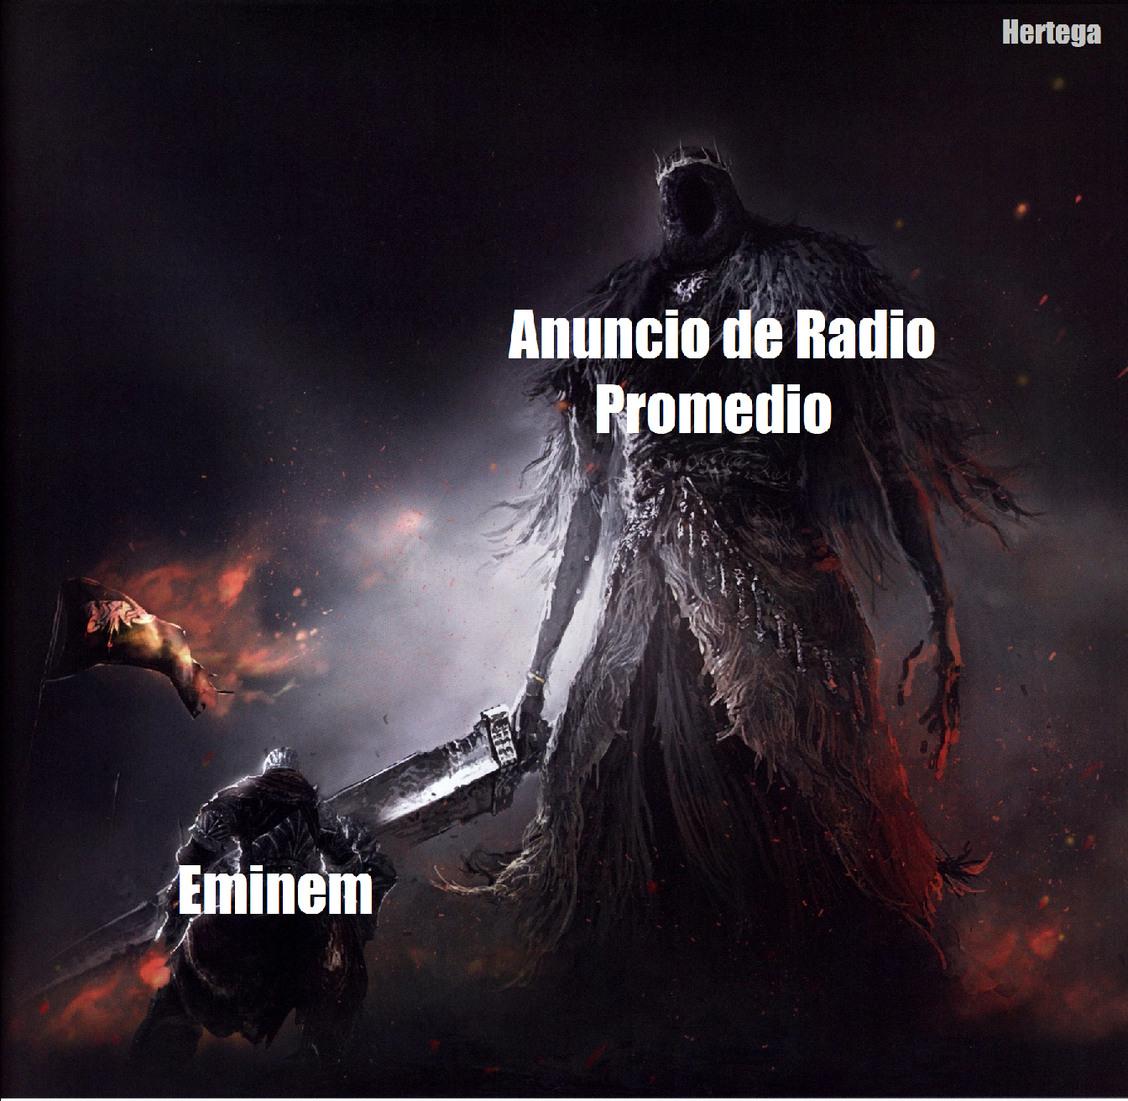 A saminameriqueiasudboakbahpsdibasd - meme